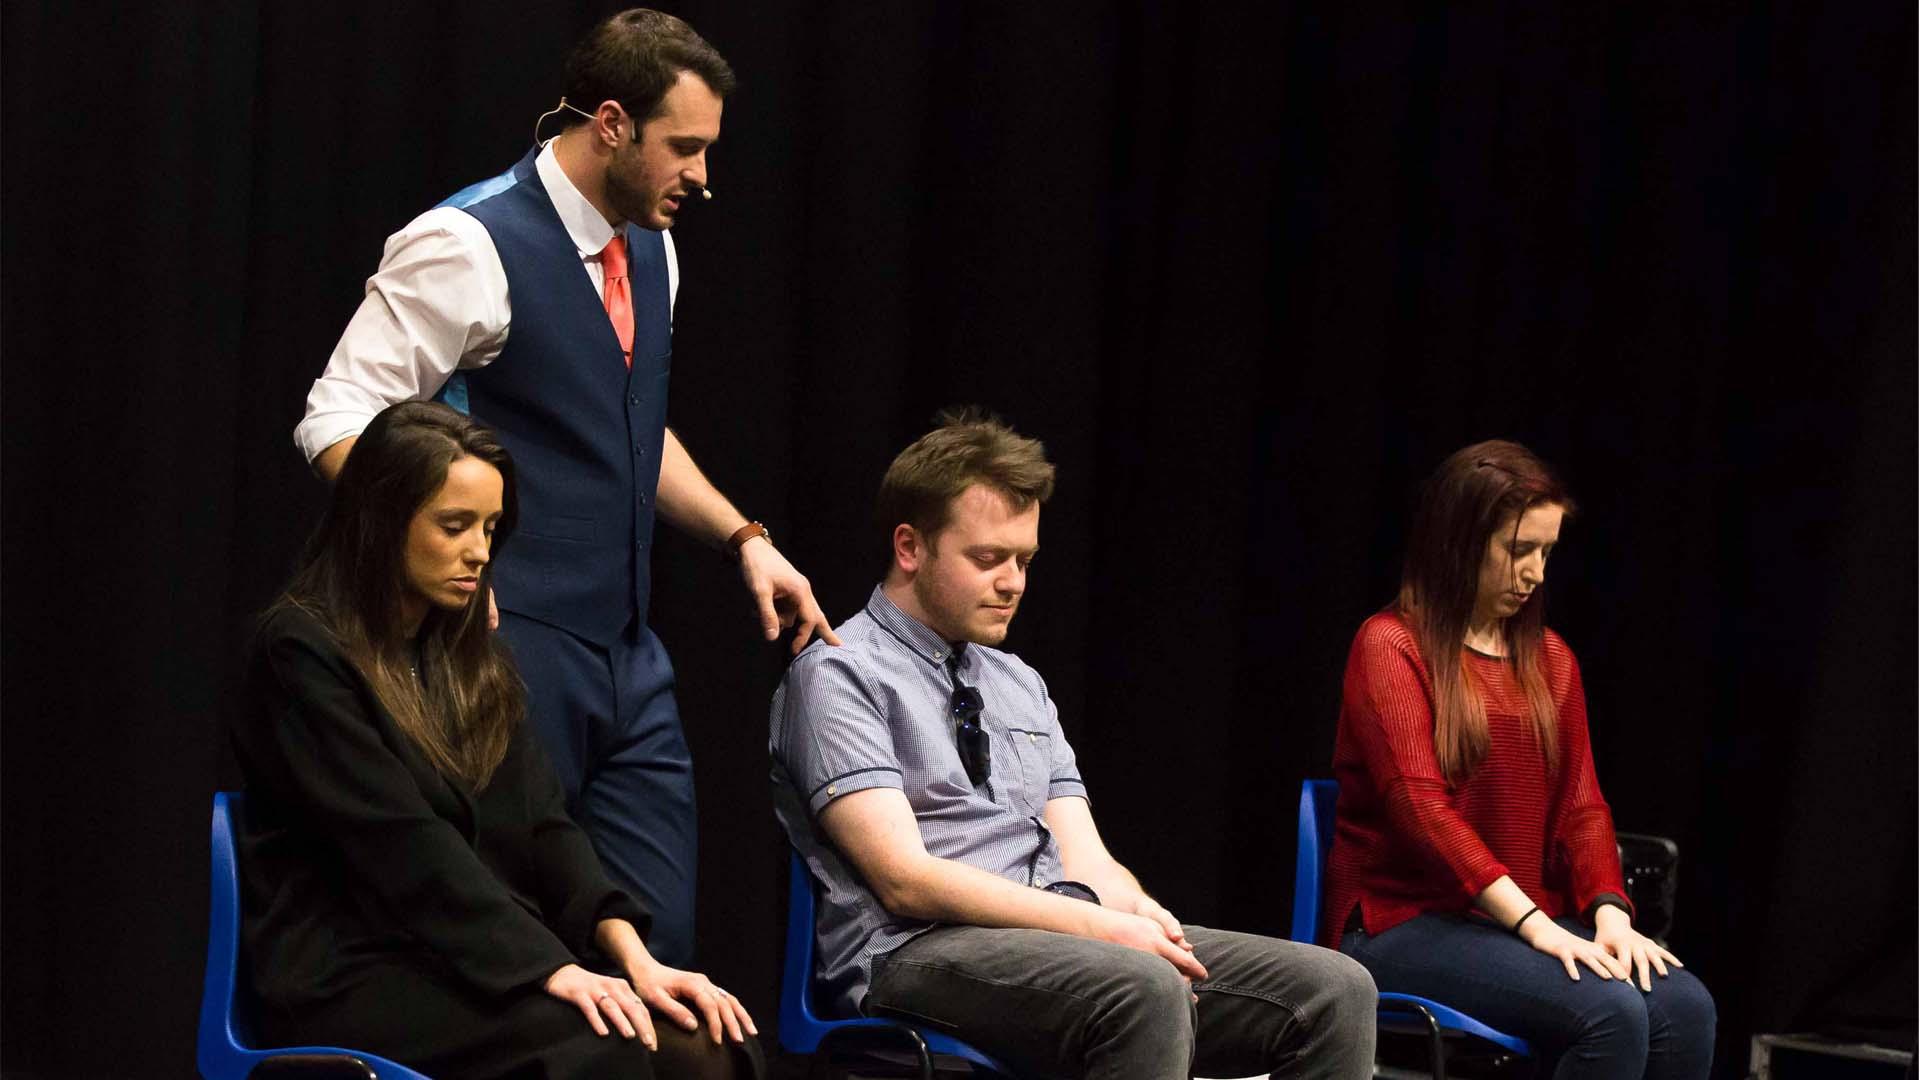 Edinburgh fringe particpants hypnotised on stage in mind games